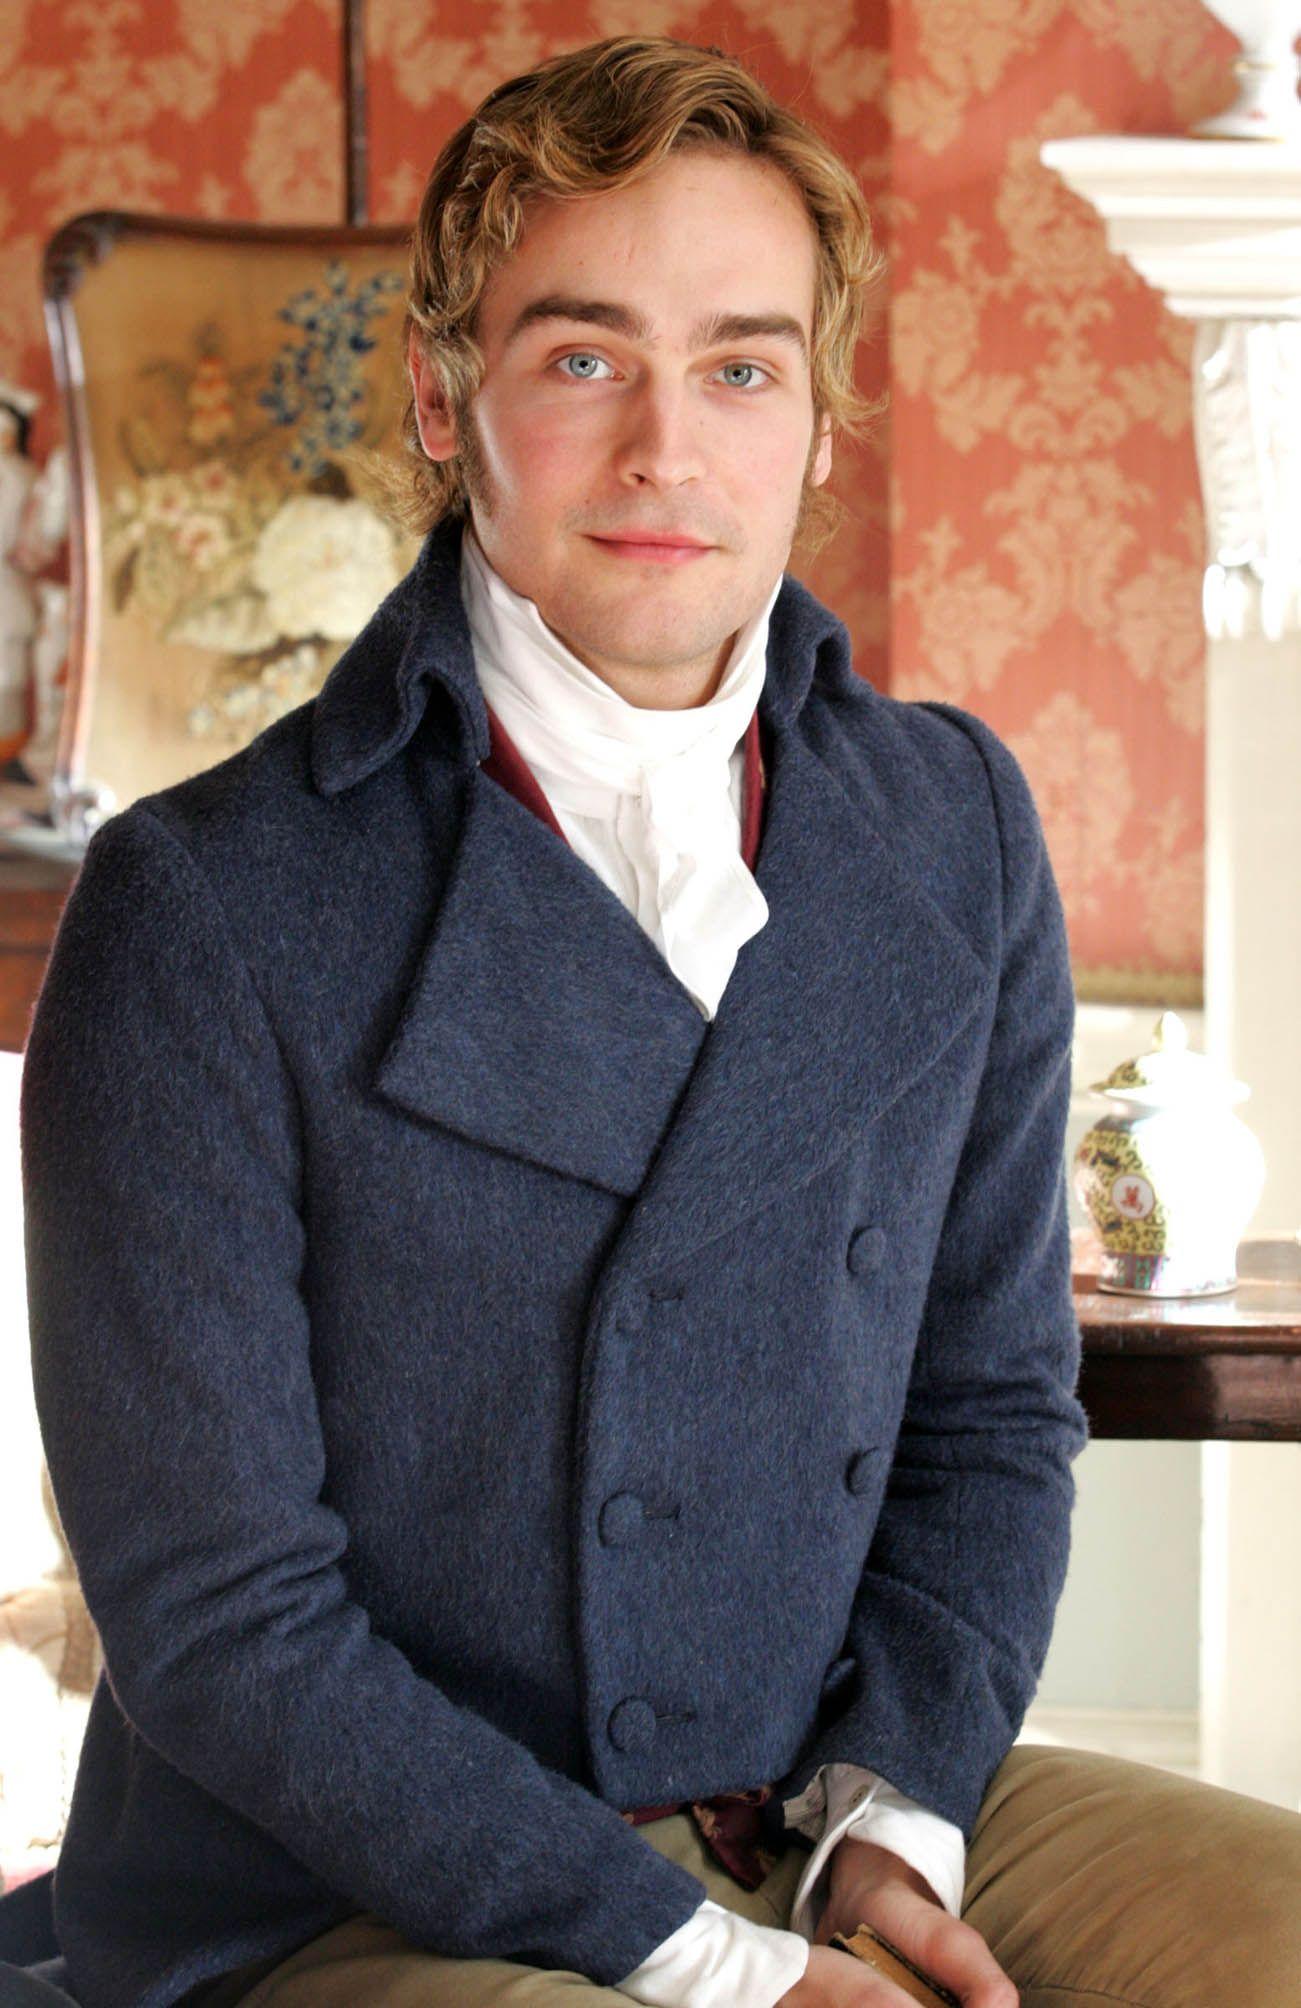 Tom Mison as Lord John Grey